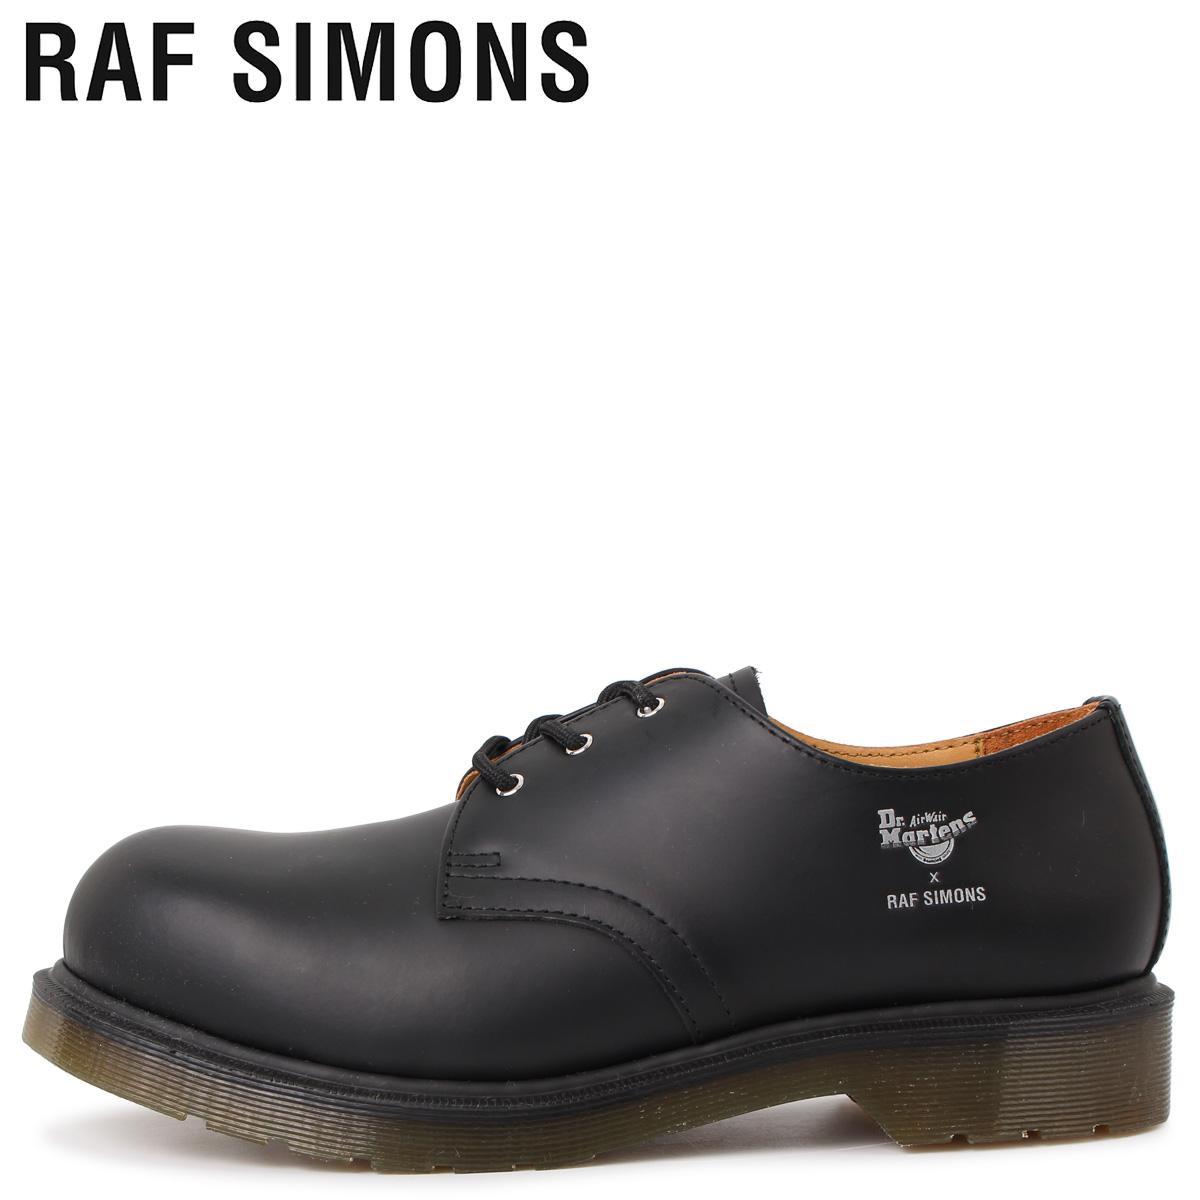 Dr.Martens ドクターマーチン RAF SIMONS ラフシモンズ 3ホール シューズ メンズ コラボ ASYMMETRIC CUT OUT STEEL TOE SHOE ブラック 黒 192-937D